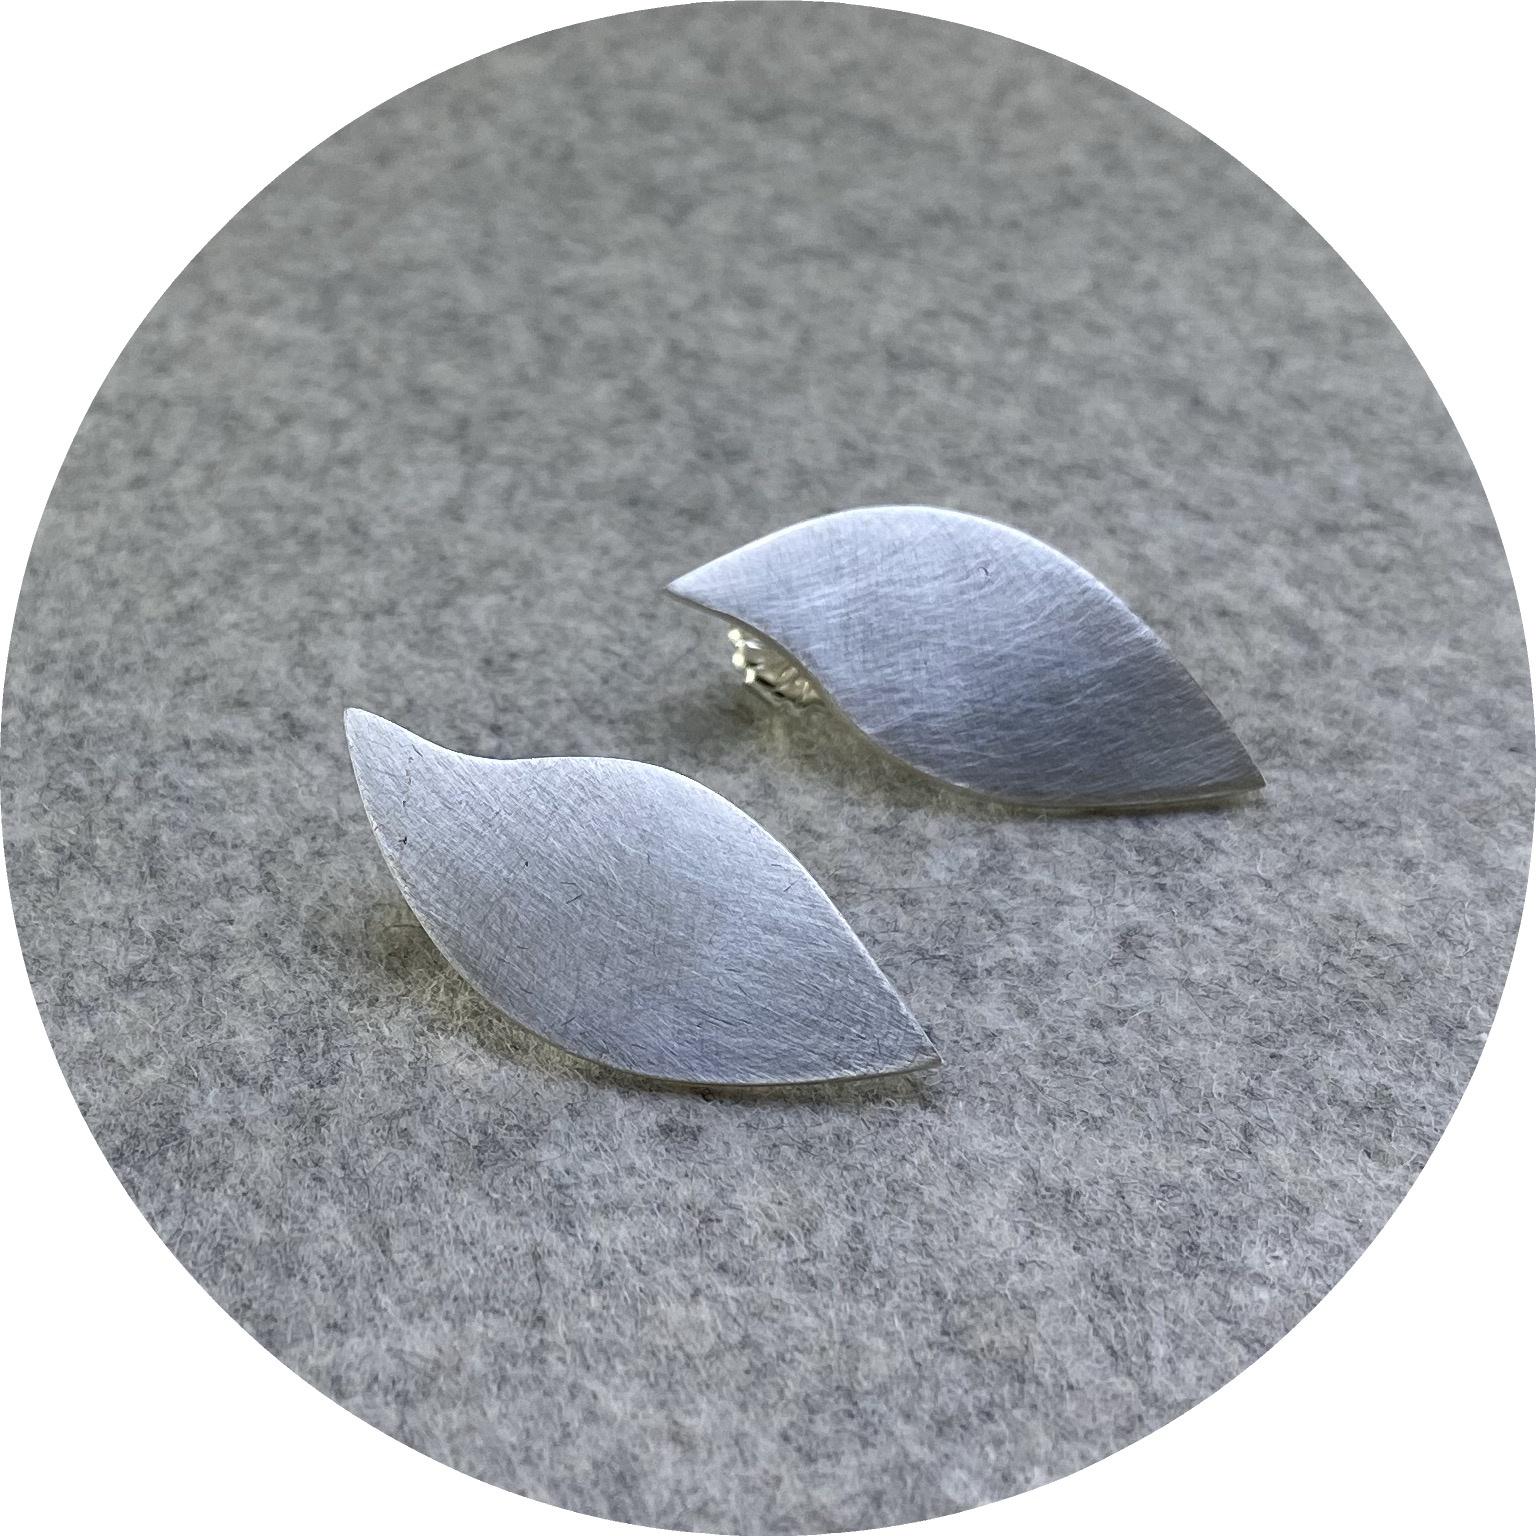 Rengin Guner - 'Leaf Earring', 925 silver